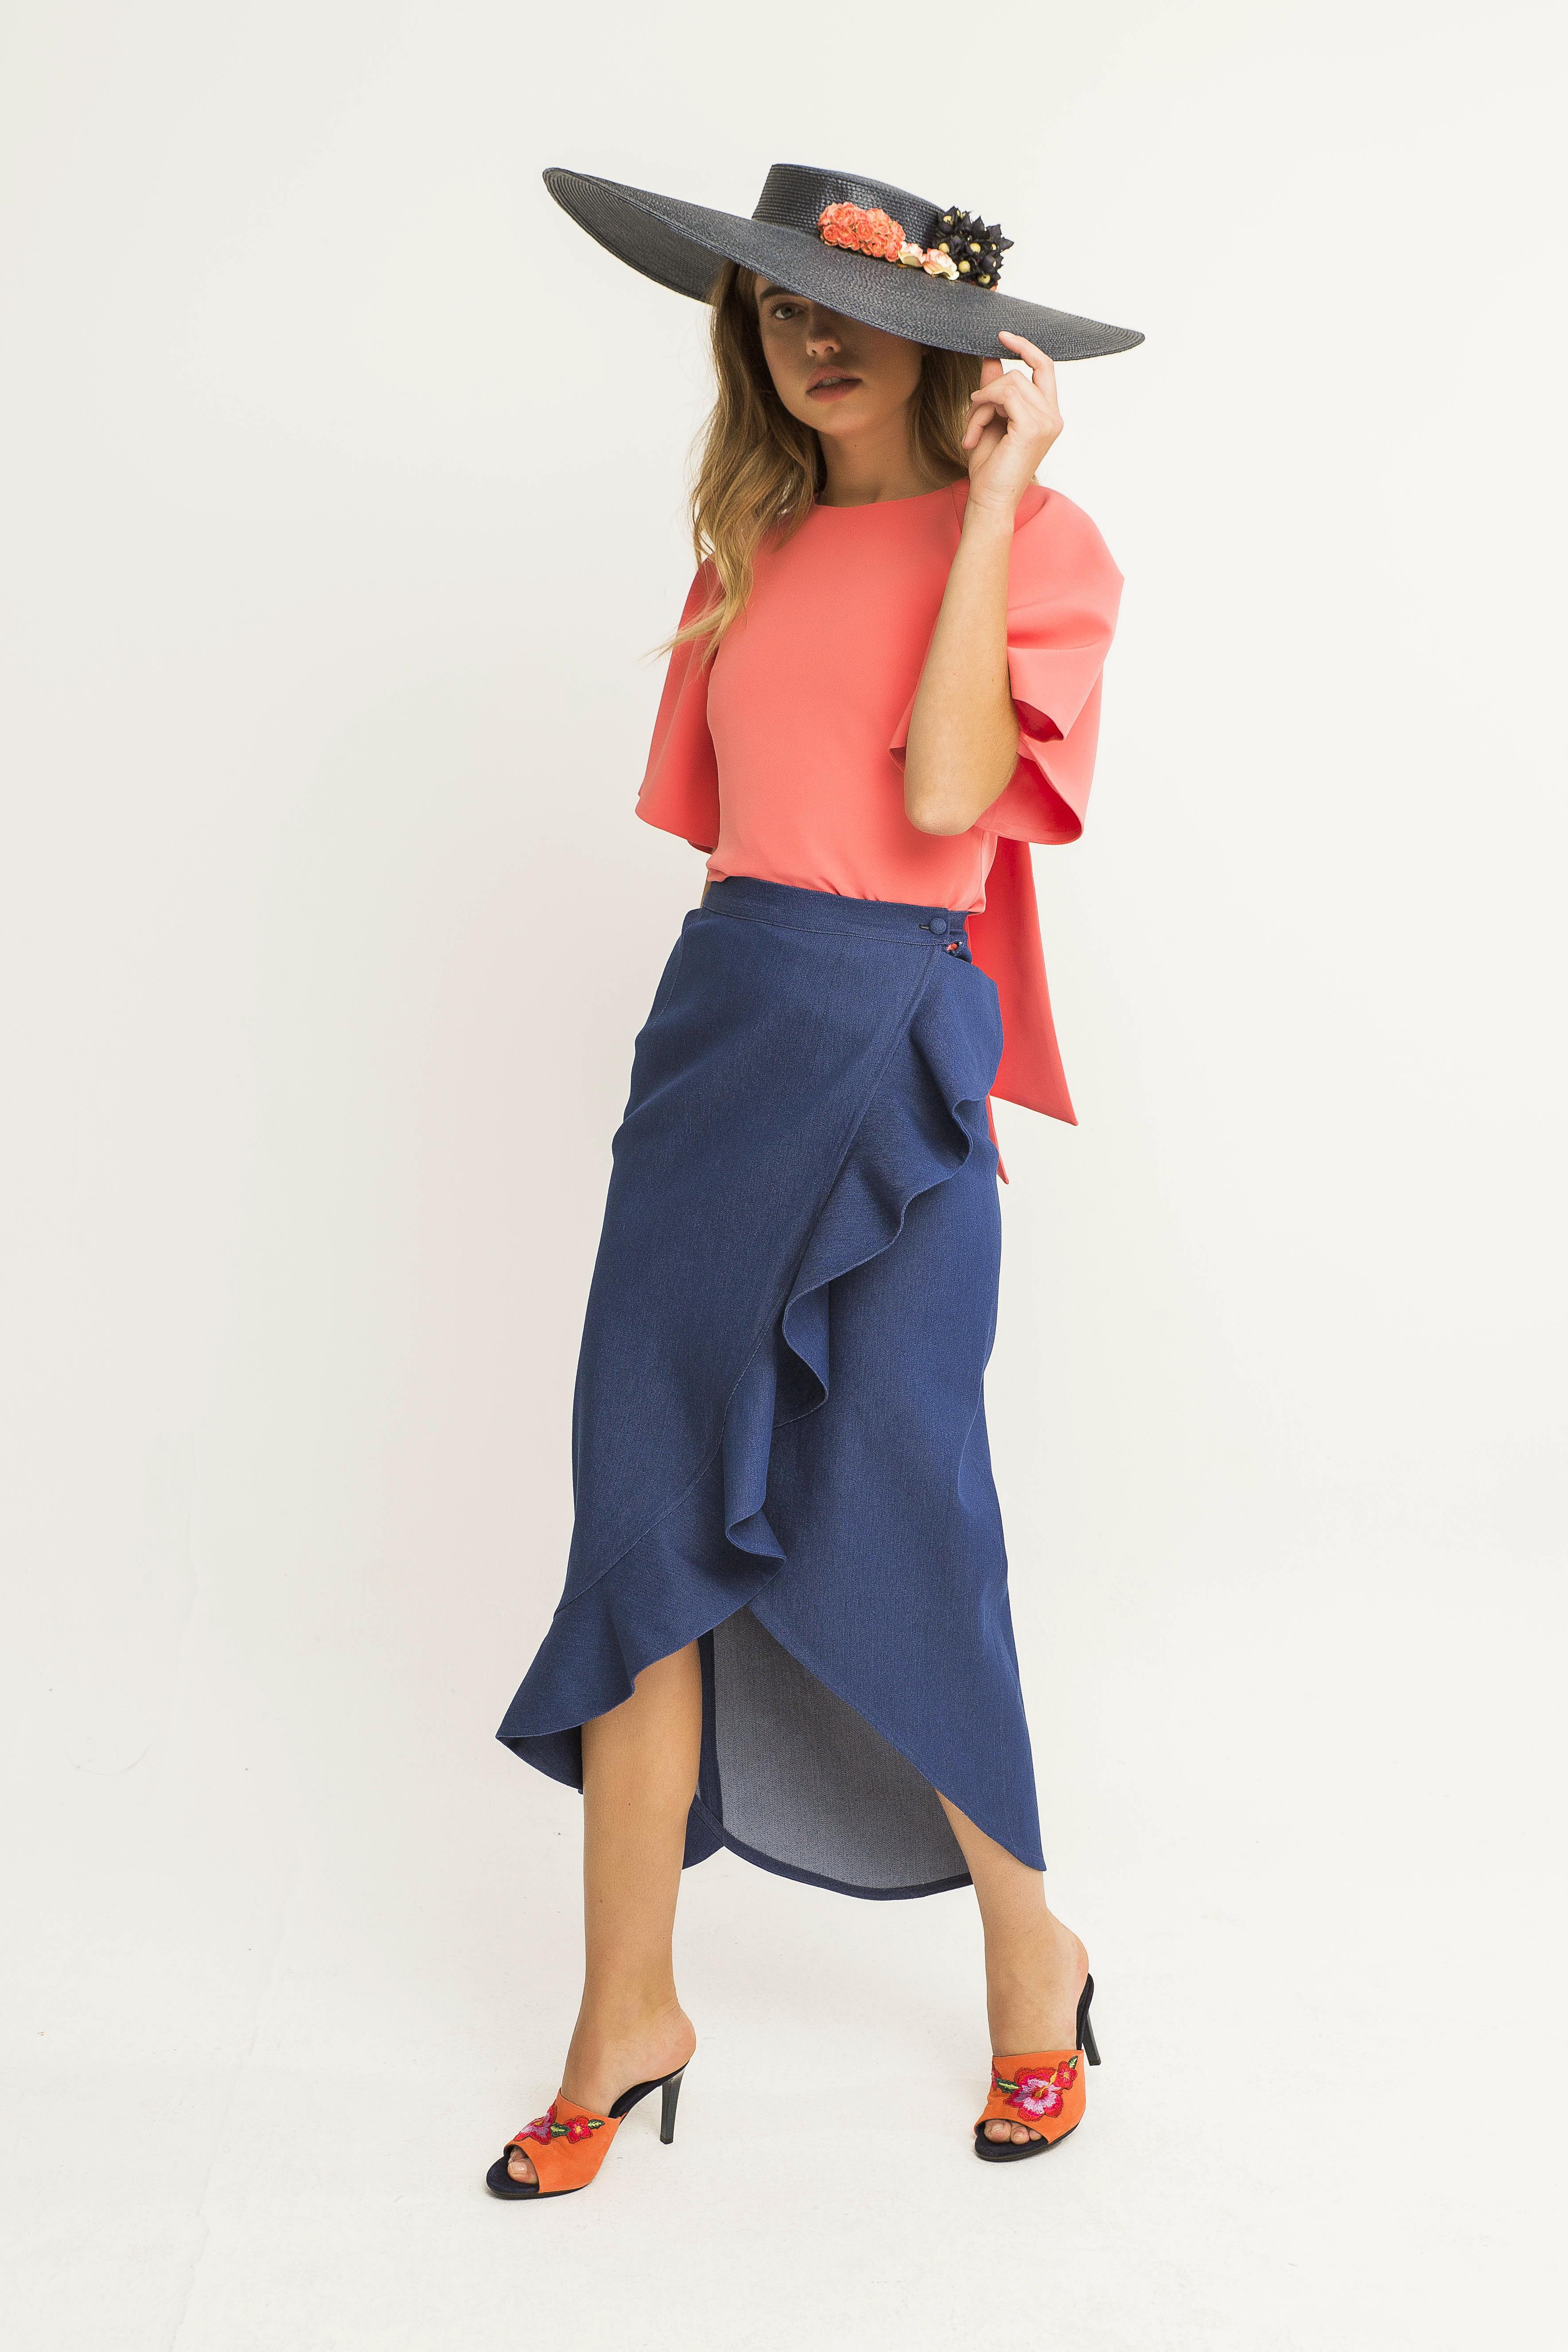 look falda vaquera asimetrica lilit blusca coral y pamela negra